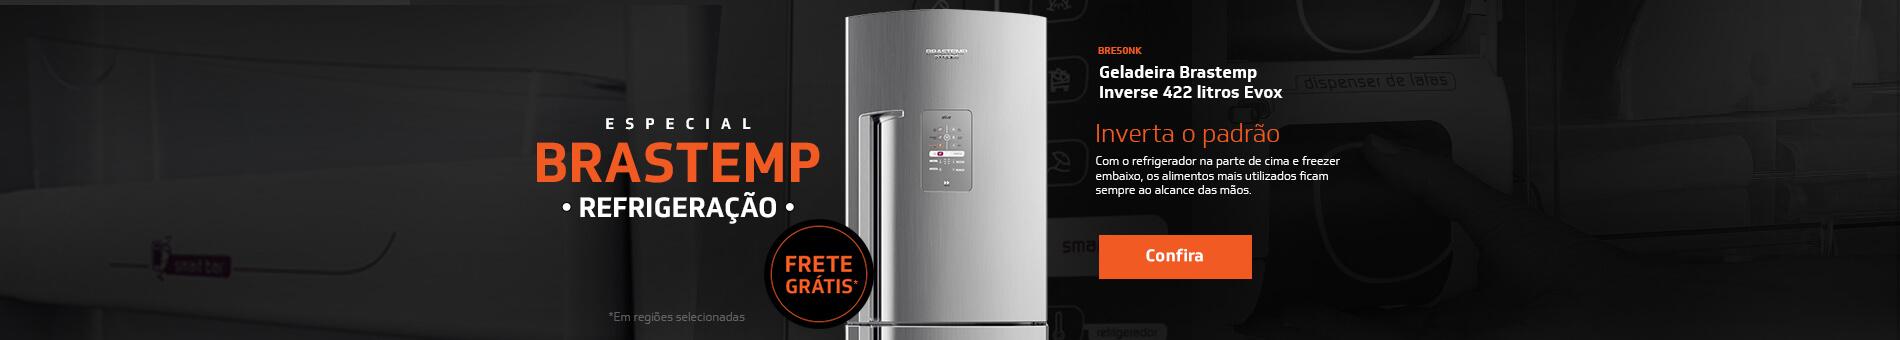 Promoção Interna - 1010 - especialrefri_invertaopadrao_home1_24102016 - invertaopadrao - 1